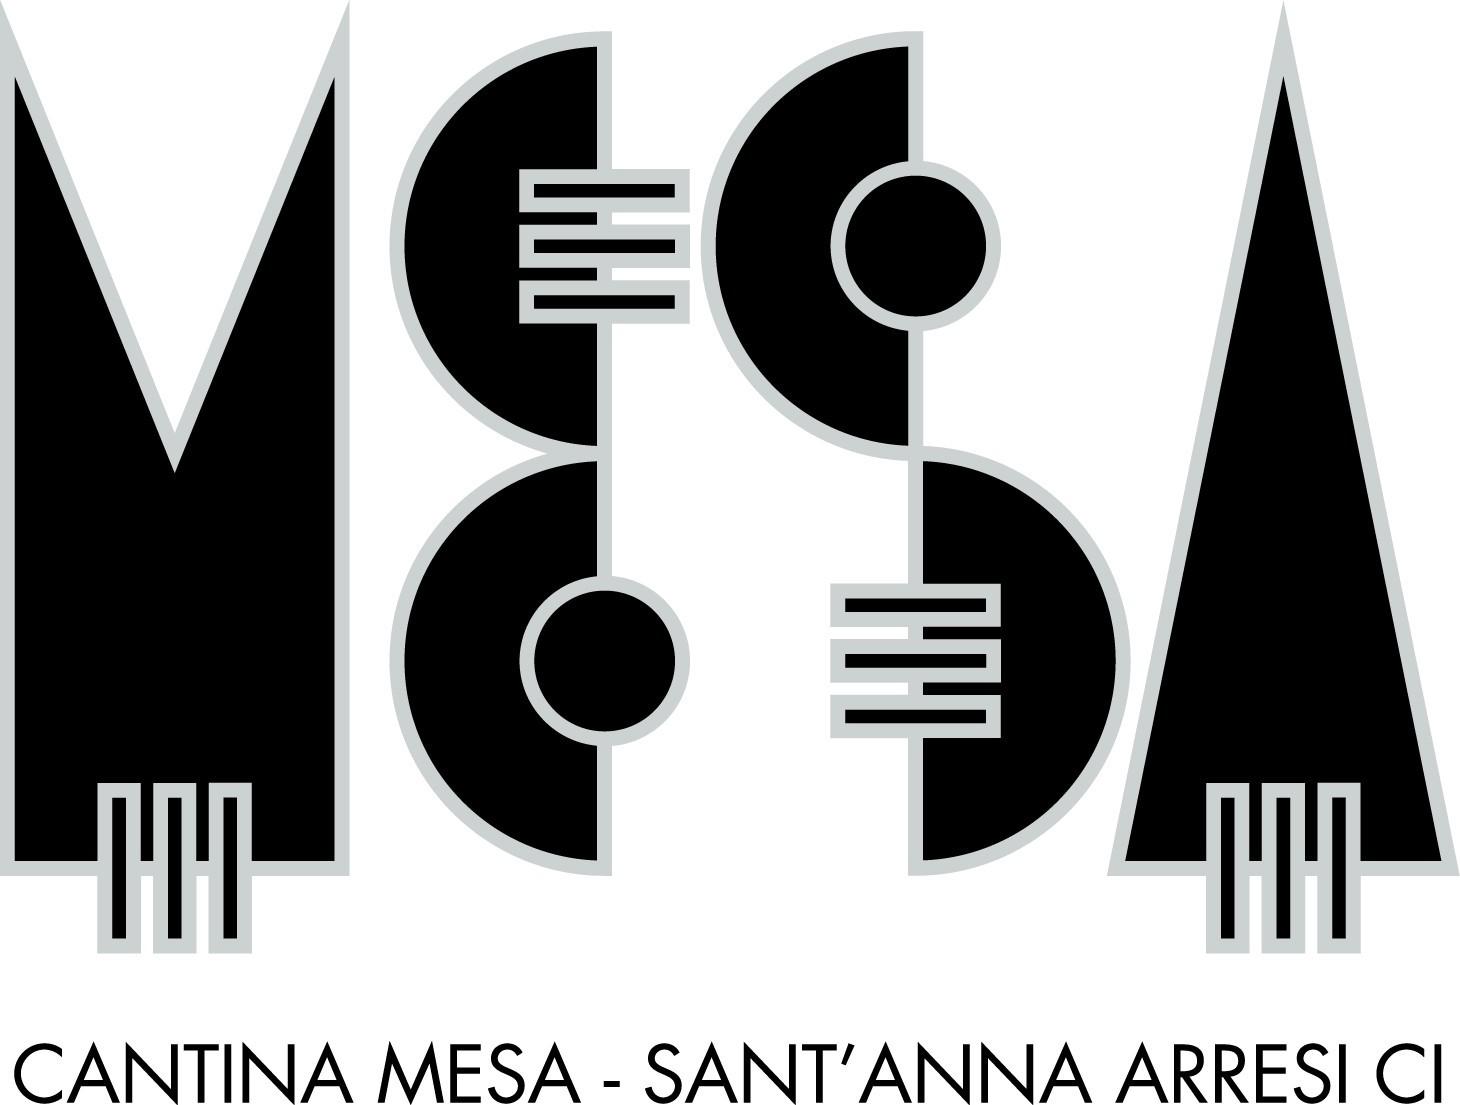 Cantina Mesa